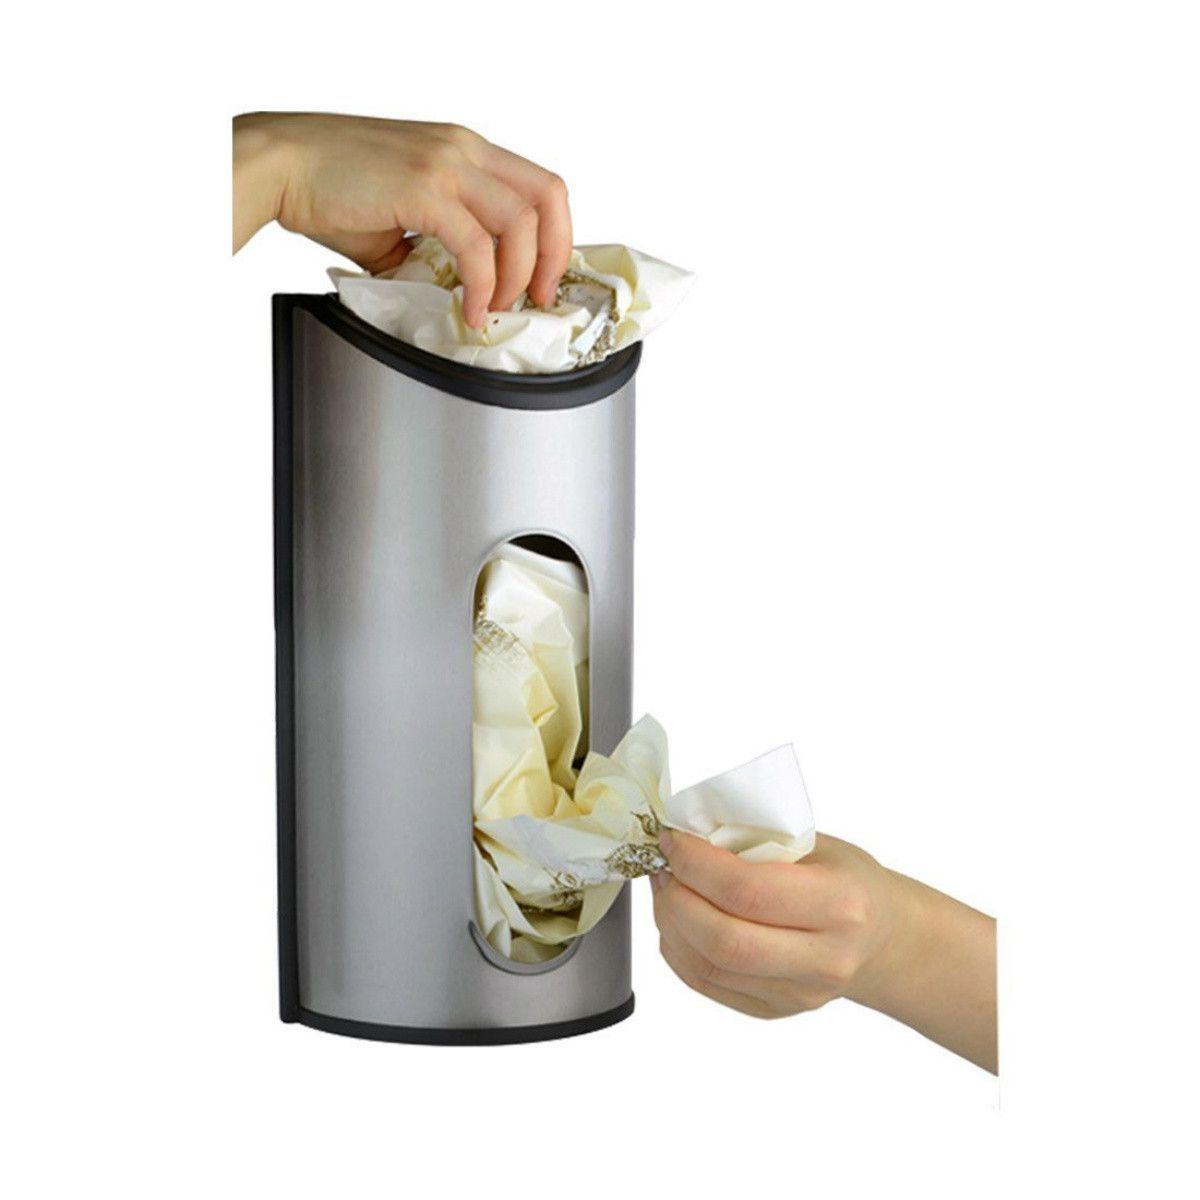 9d334fb016b Plastic Grocery Bag Holder Kitchen Organizer Wall Mount Dispenser Cabinet Plastic  grocery bag holder organizes and dispenses our plastic shopping bags for ...